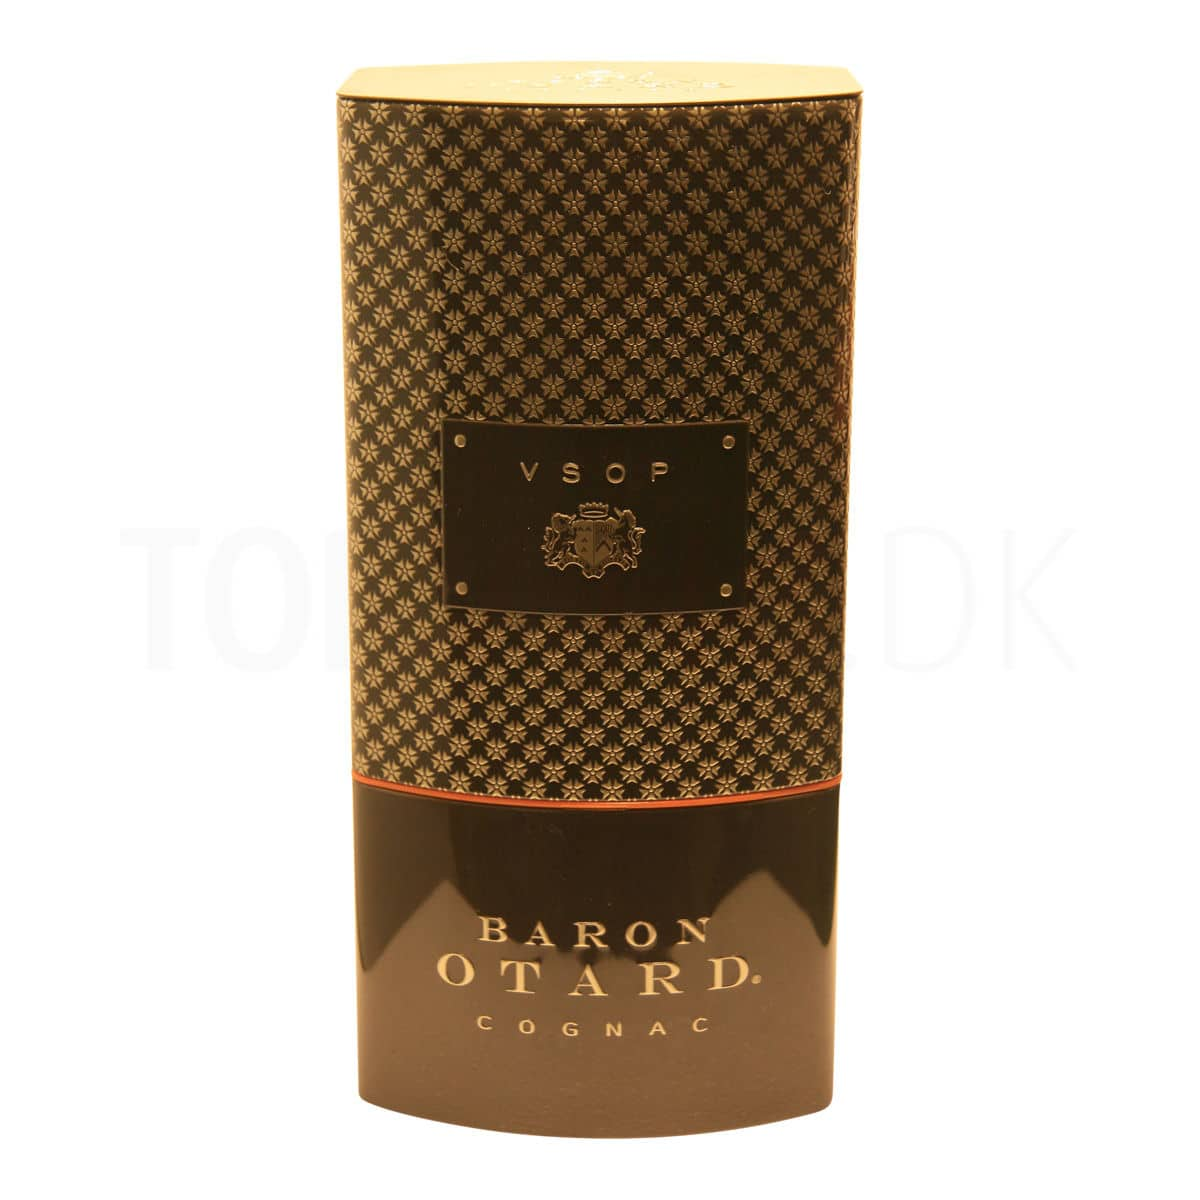 Topvine Baron Otard Cognac VSOP